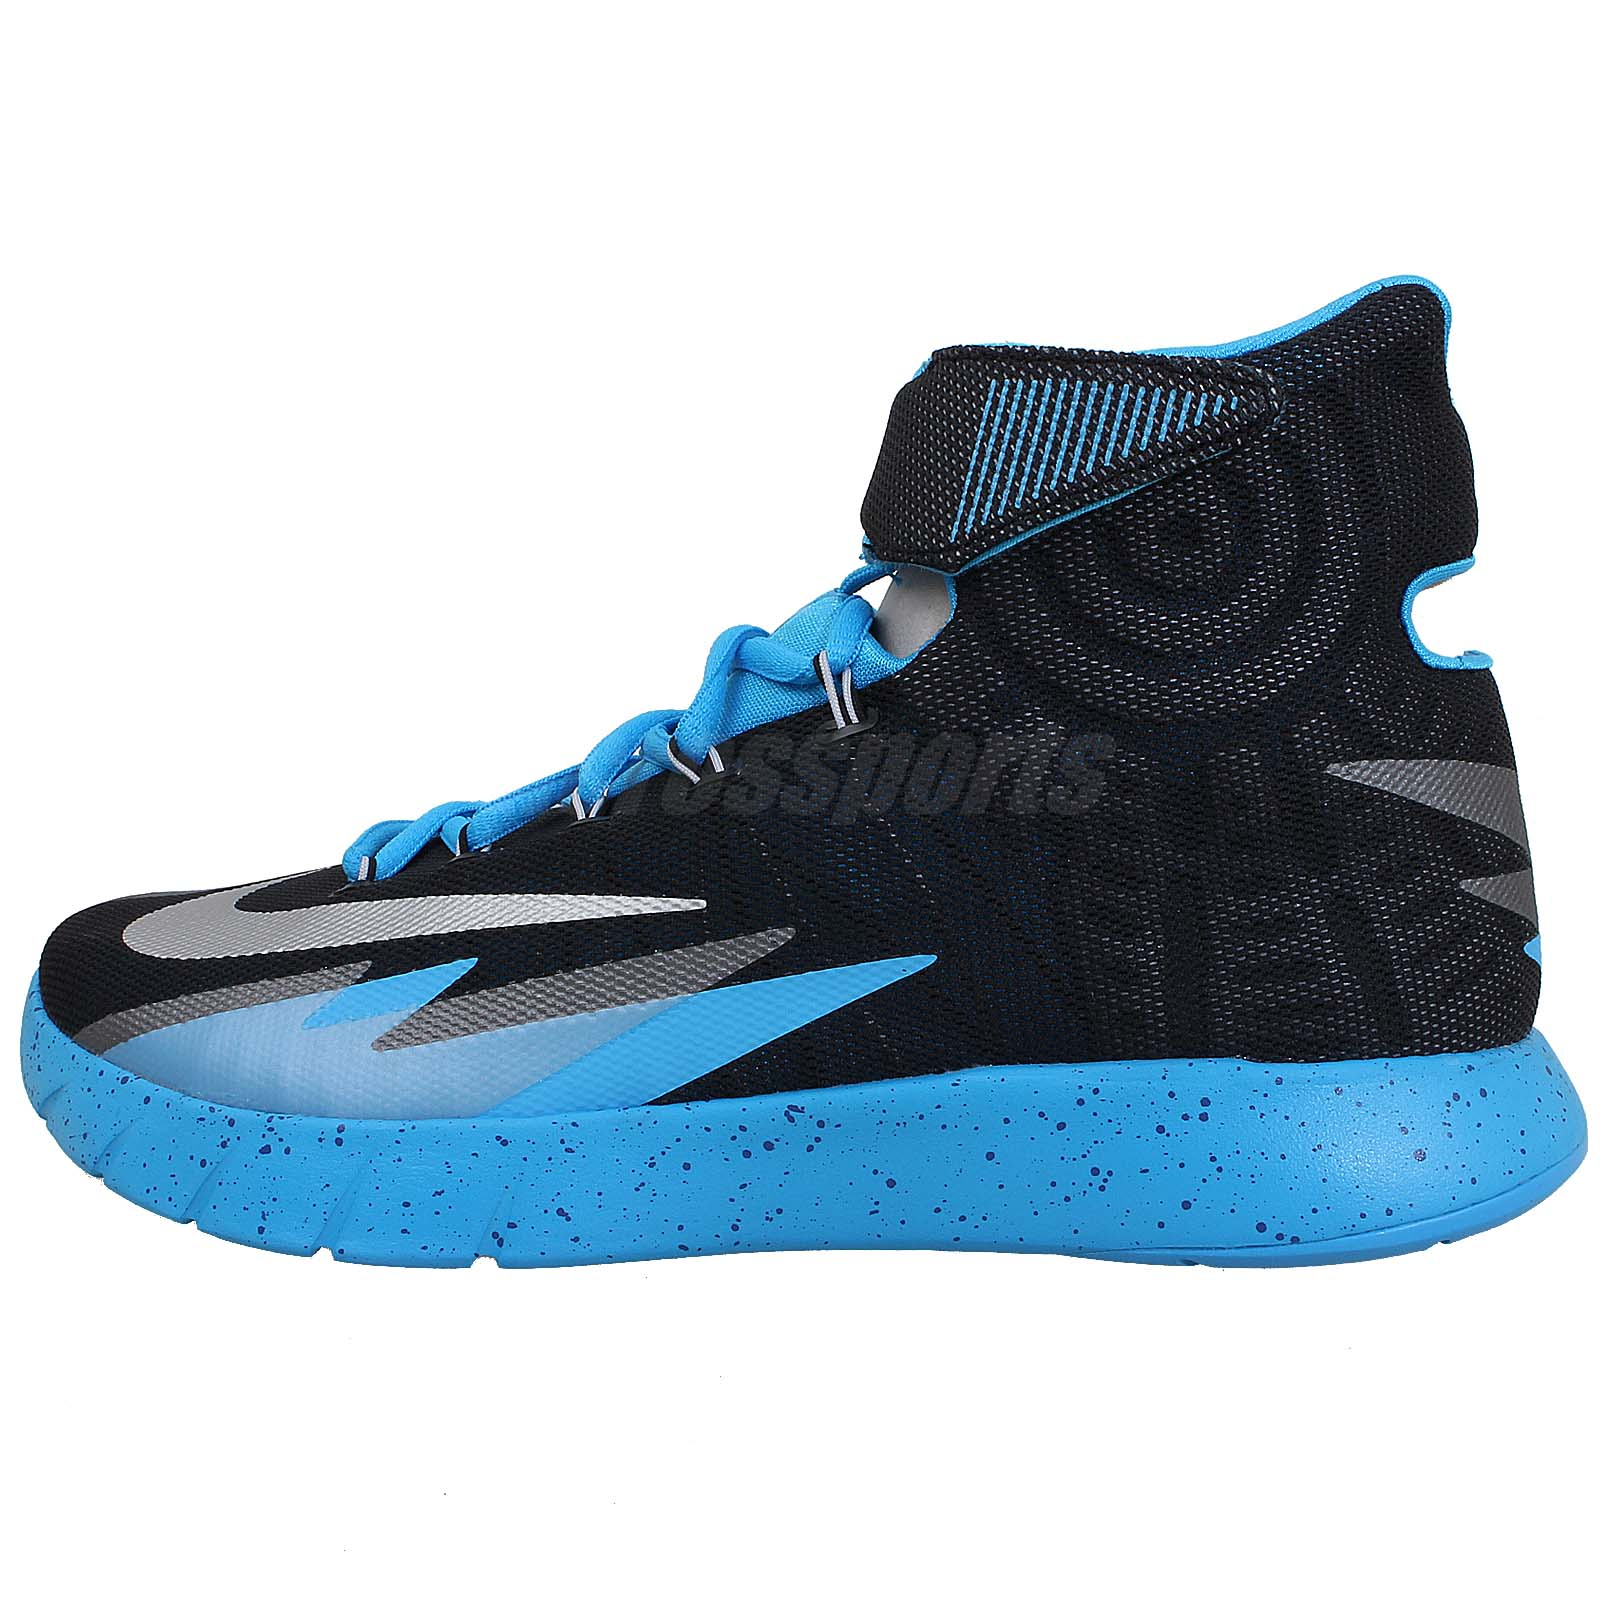 Nike Zoom Hyperrev Black Blue Silver 2014 Kyrie Irving ...